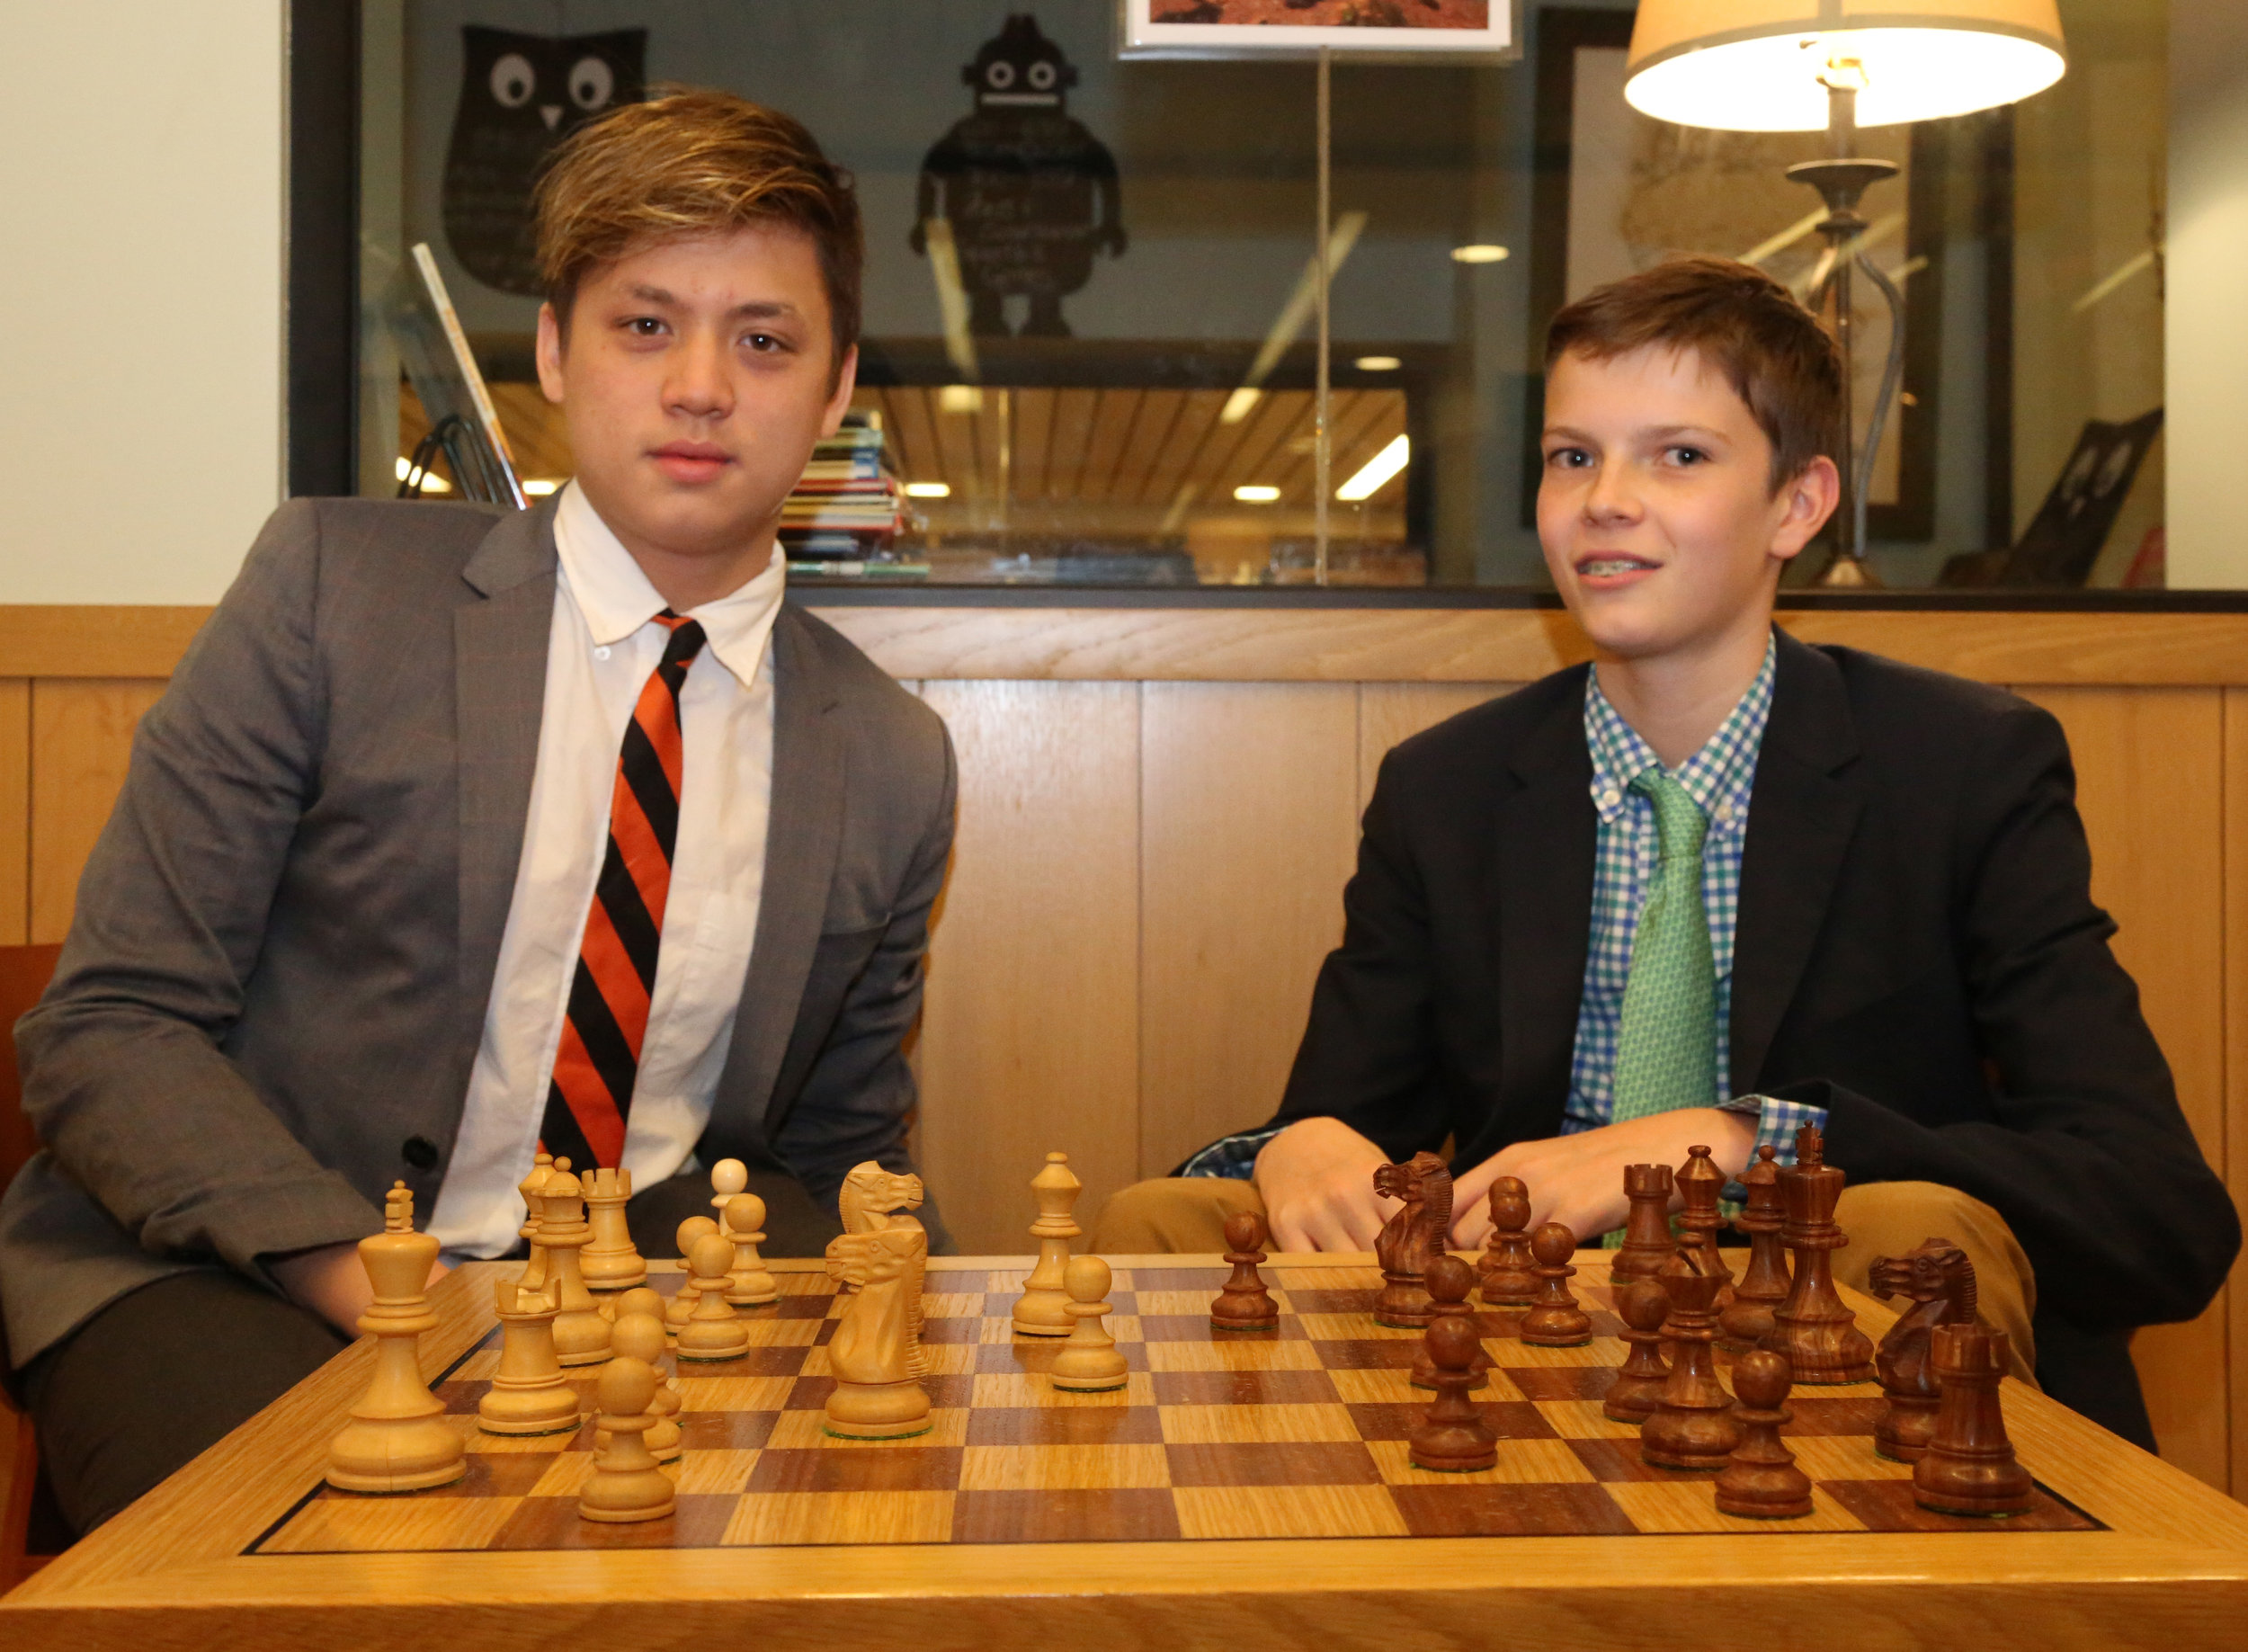 chess upper 2 cropped.JPG